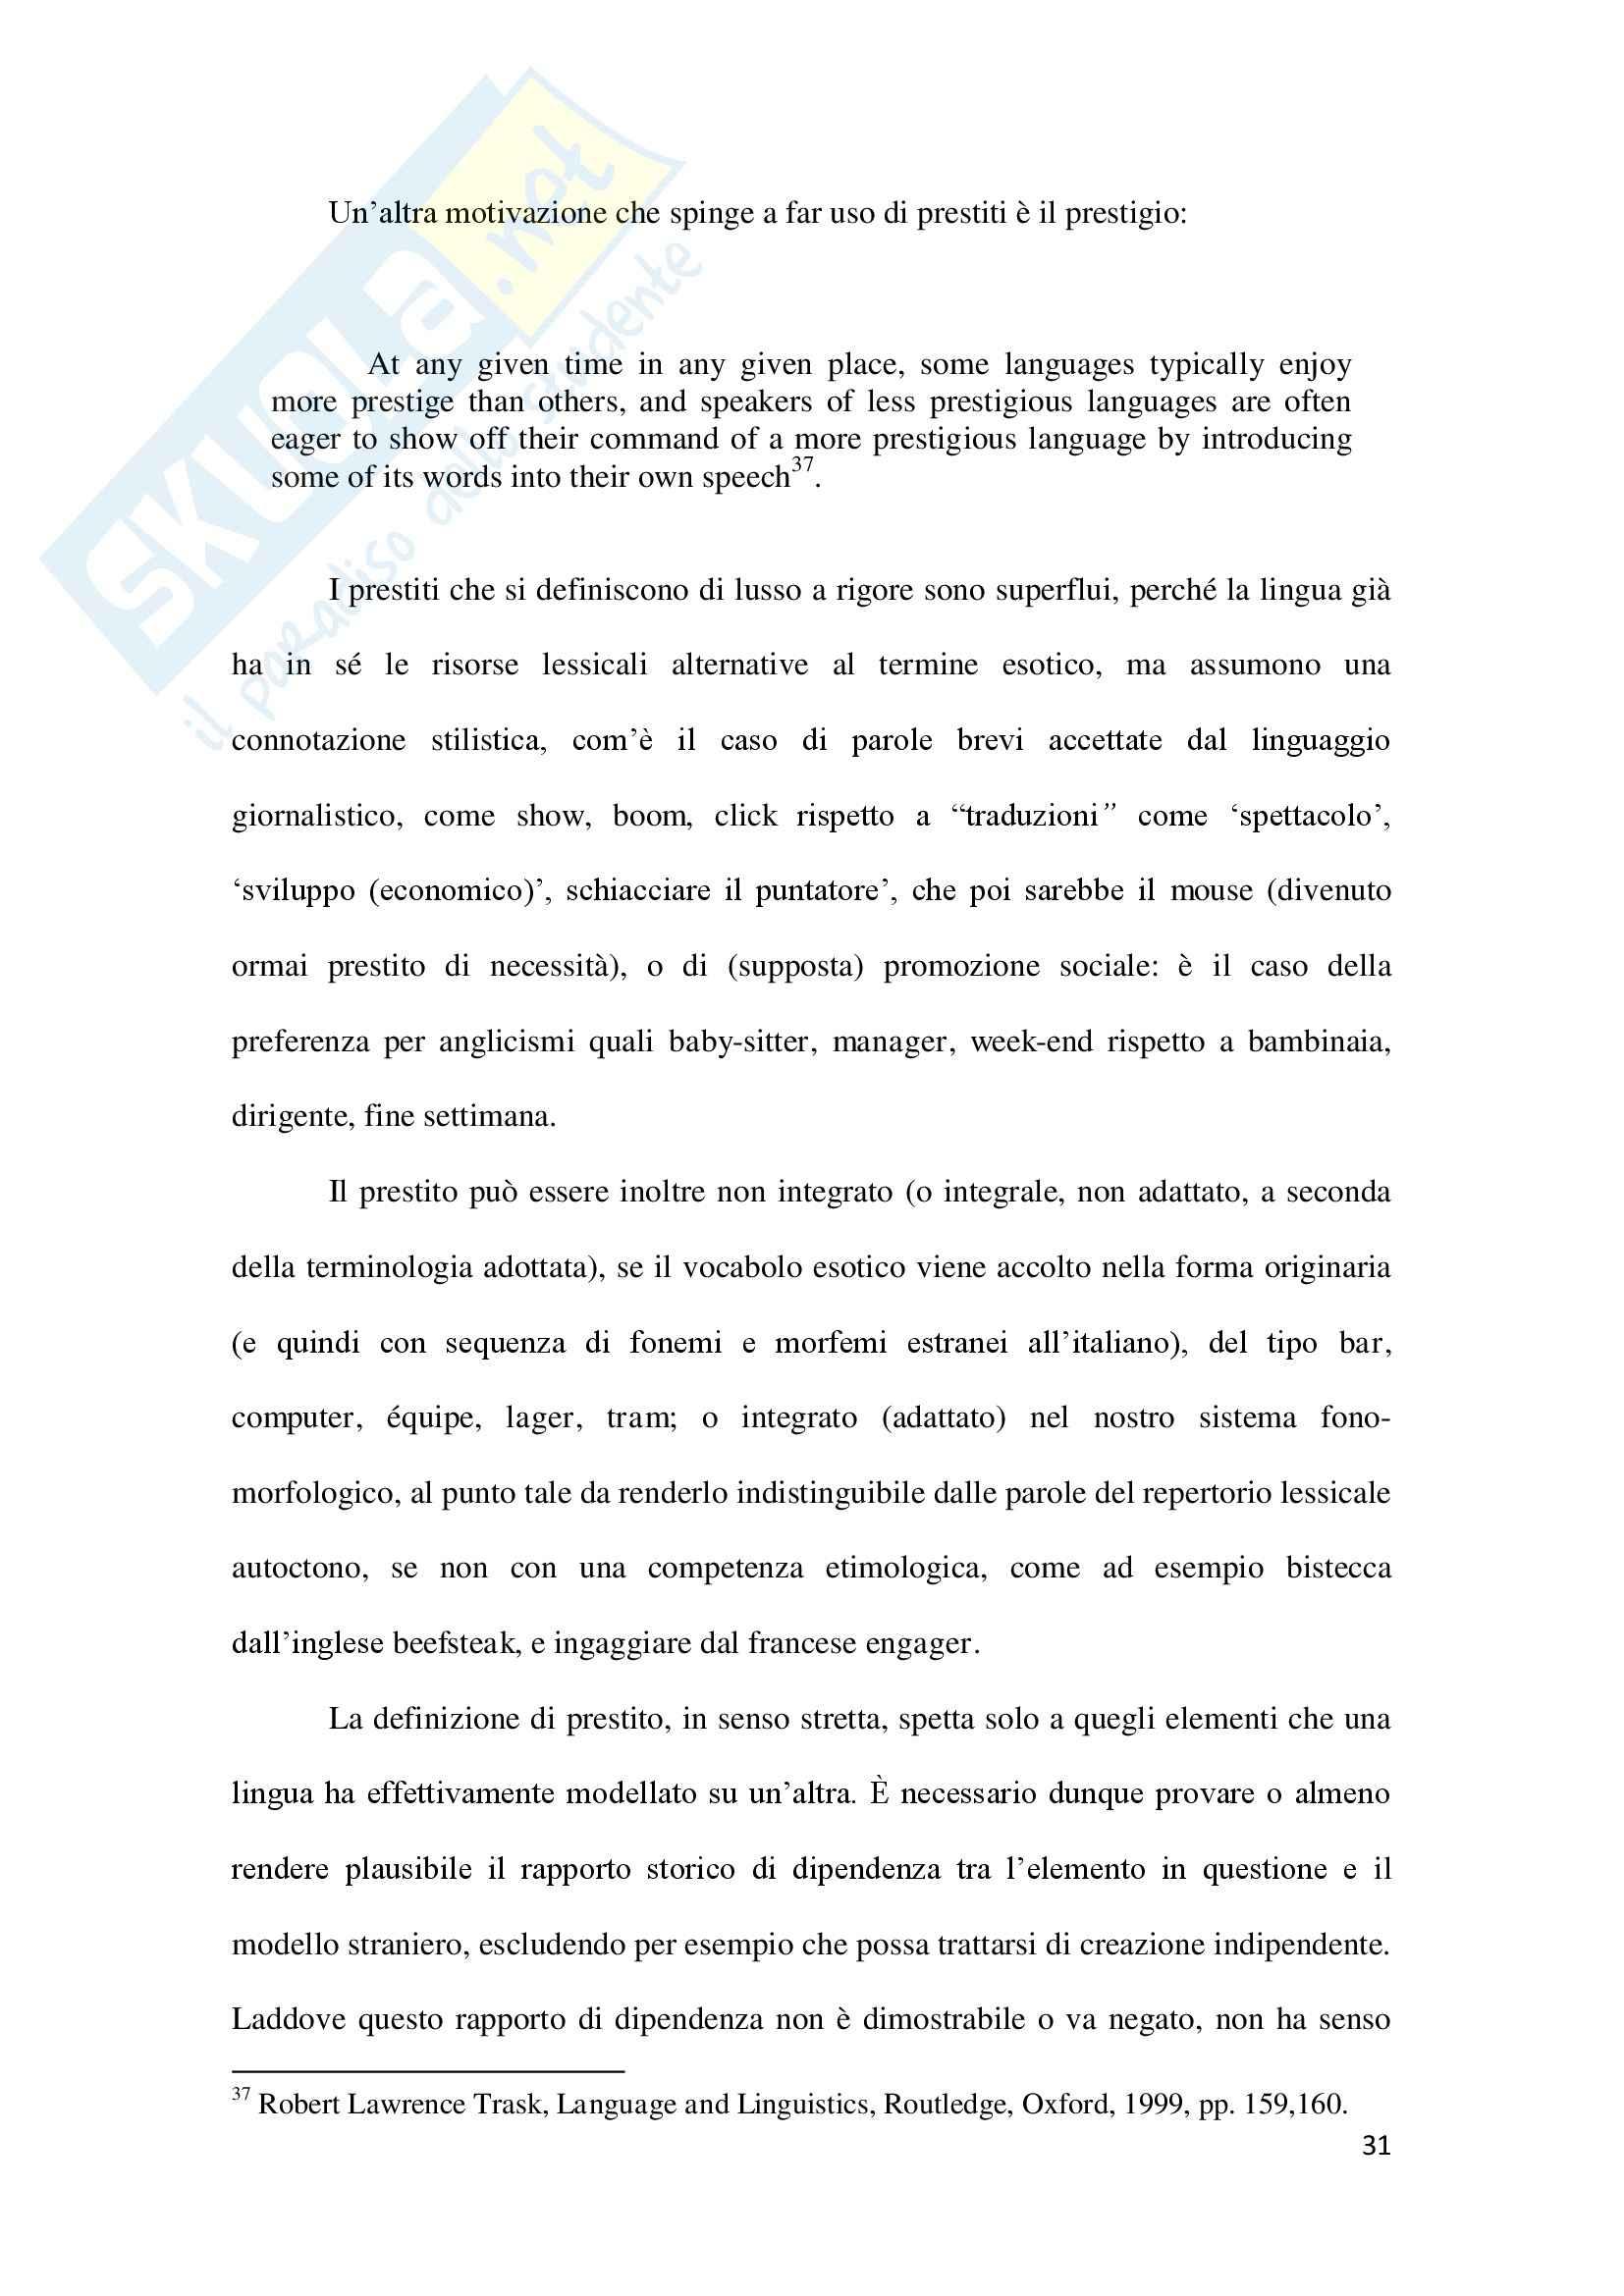 Linguaggio di Internet, Lingua inglese Pag. 31